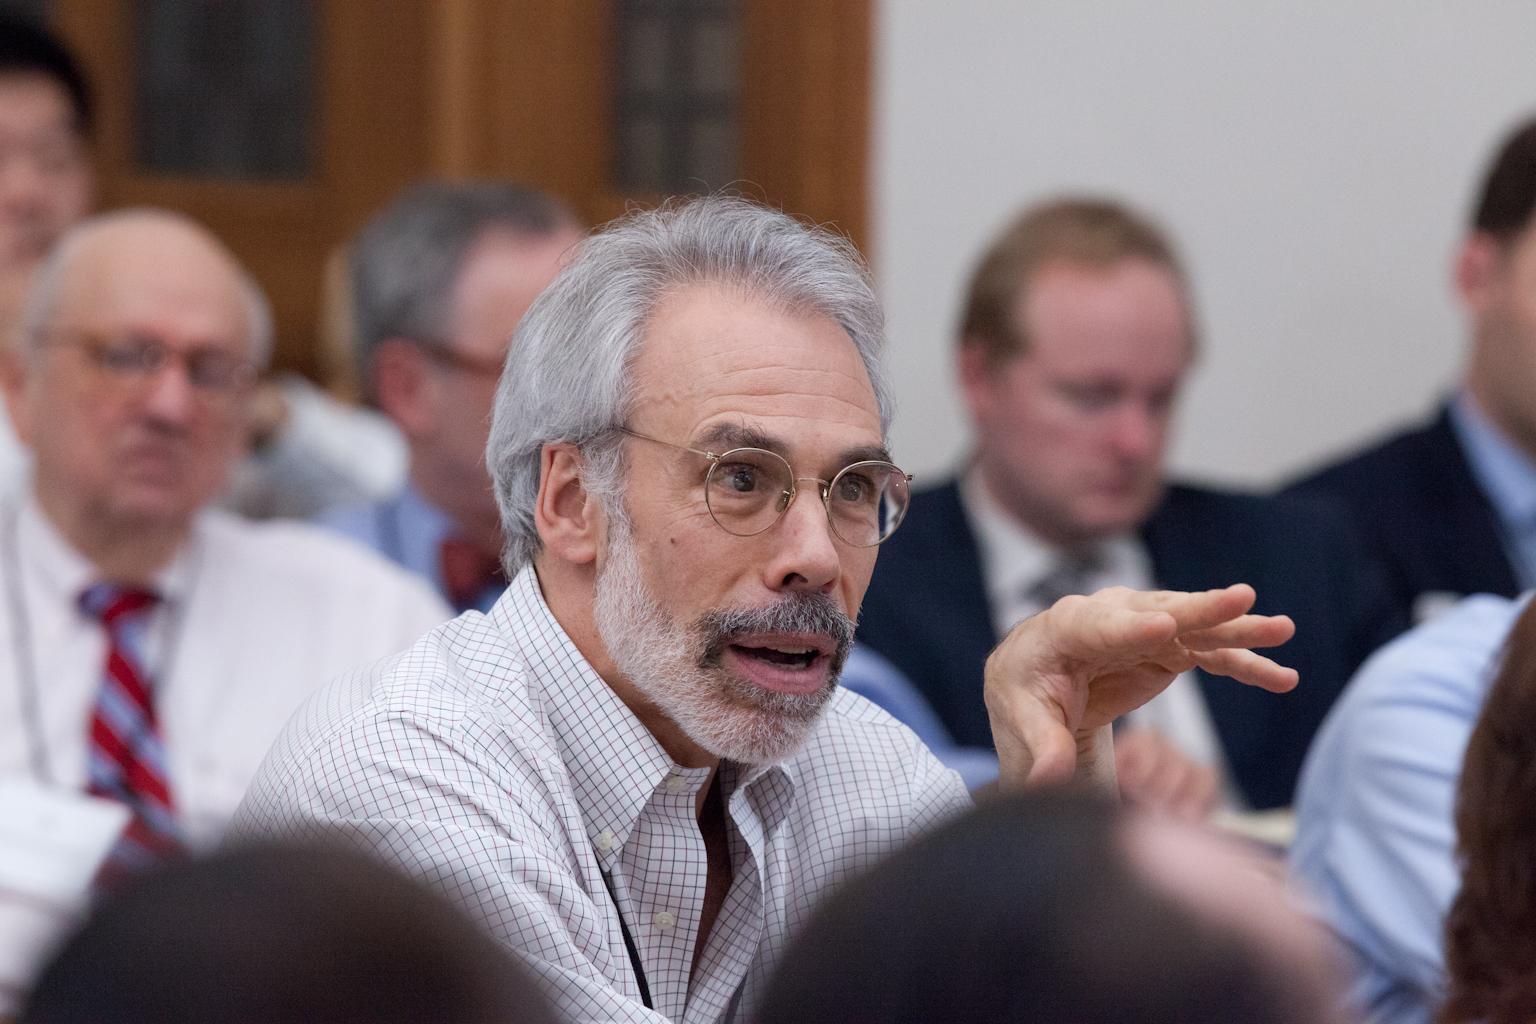 Penn. Law Prof. Ed Rock